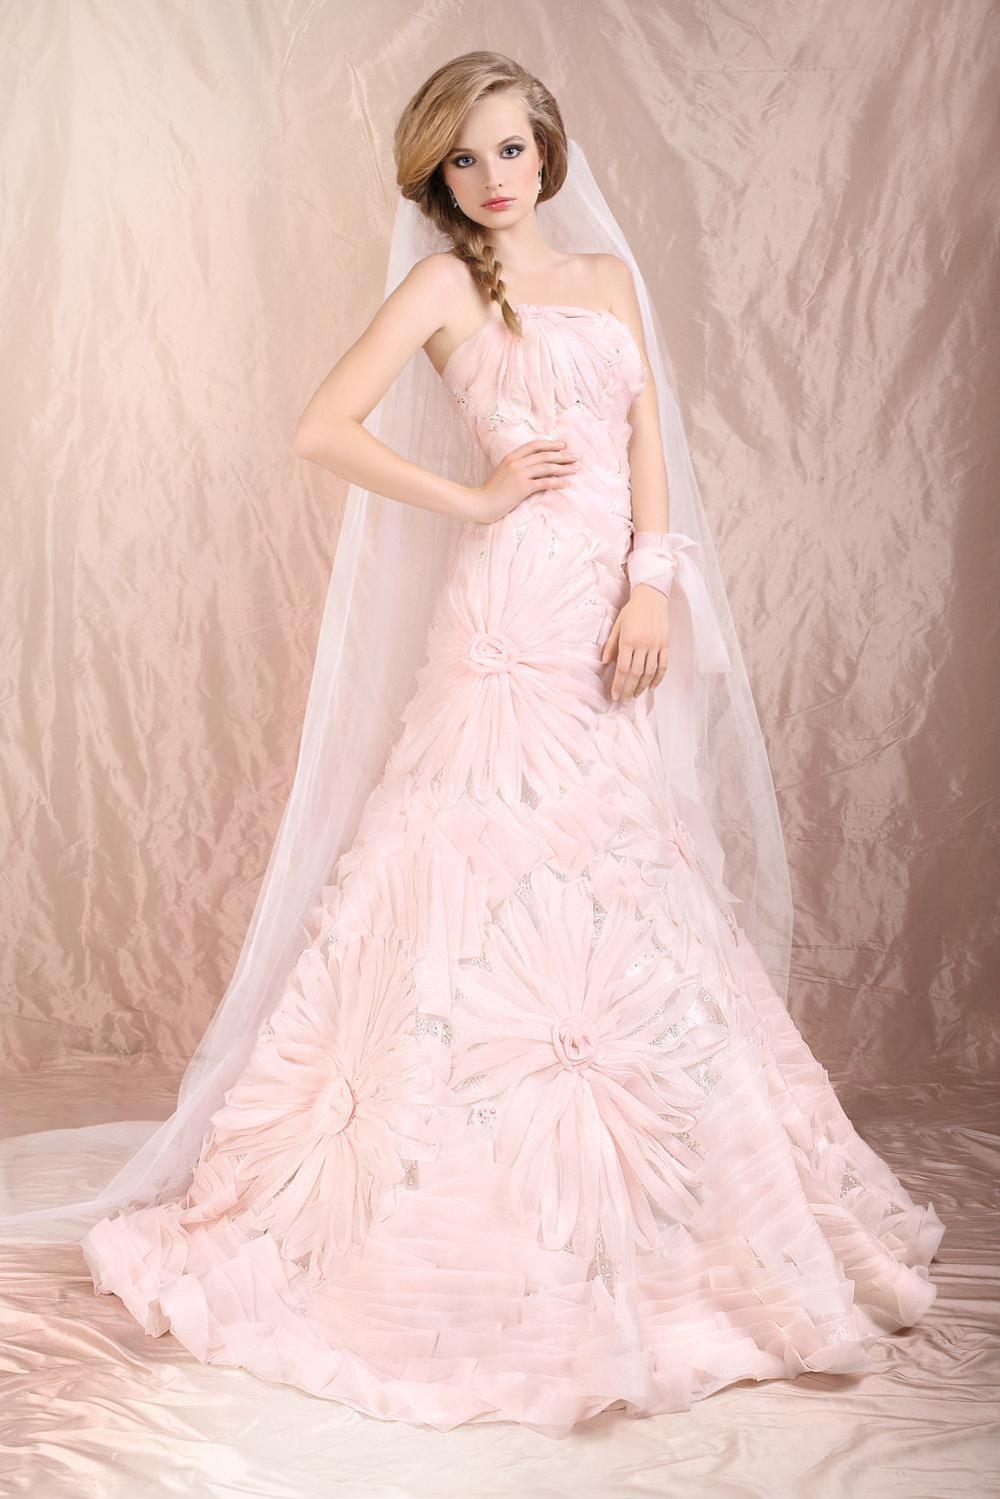 blush color wedding dress blush colored wedding dress Blush Wedding Dress Dressed Up Girl